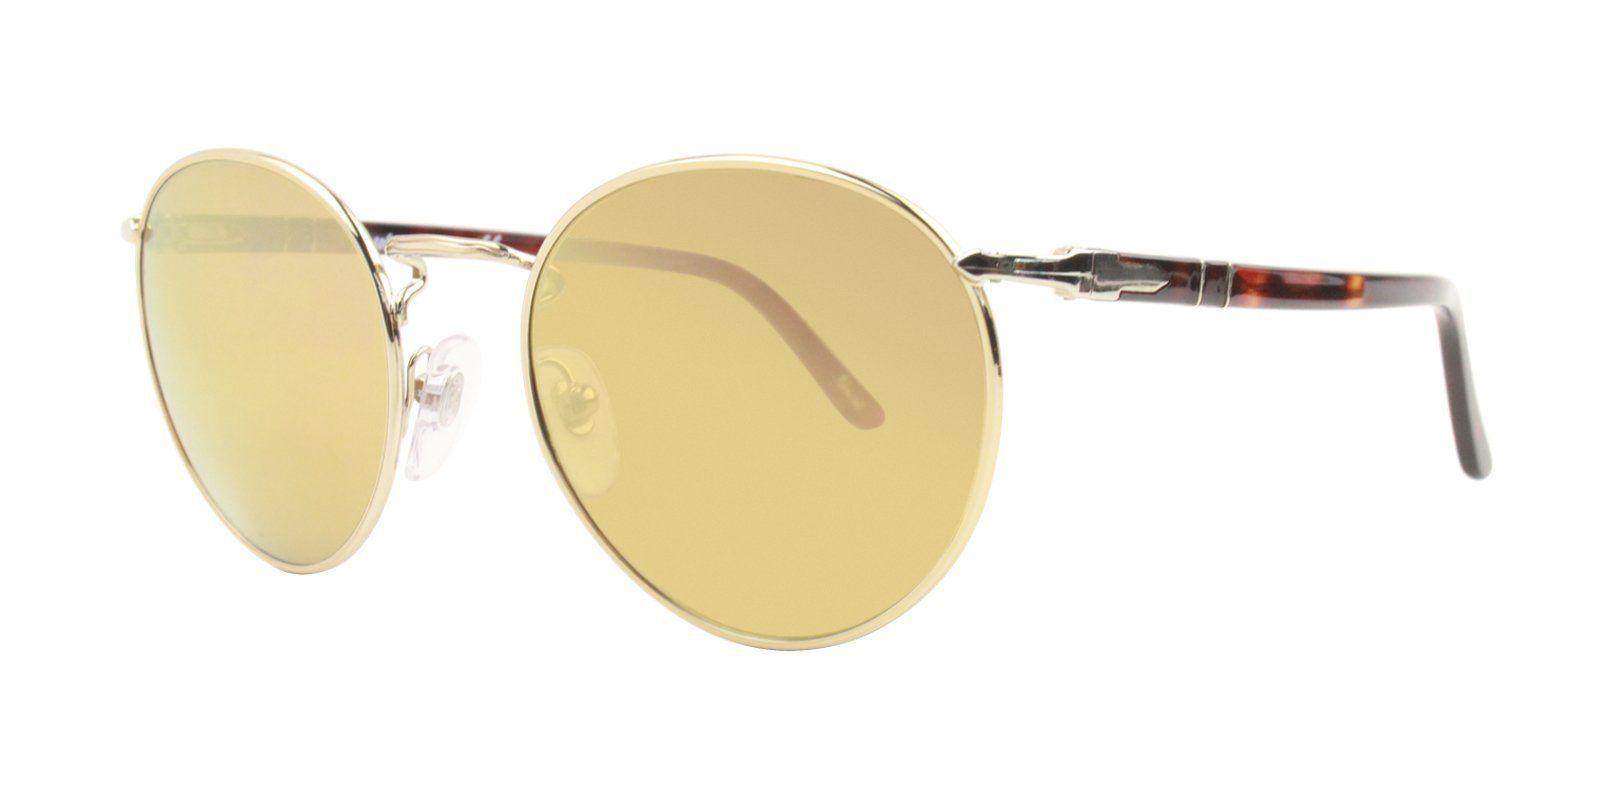 9fb2c32c9d1e3 Persol - PO2388-S Gold - Gold-sunglasses-Designer Eyes